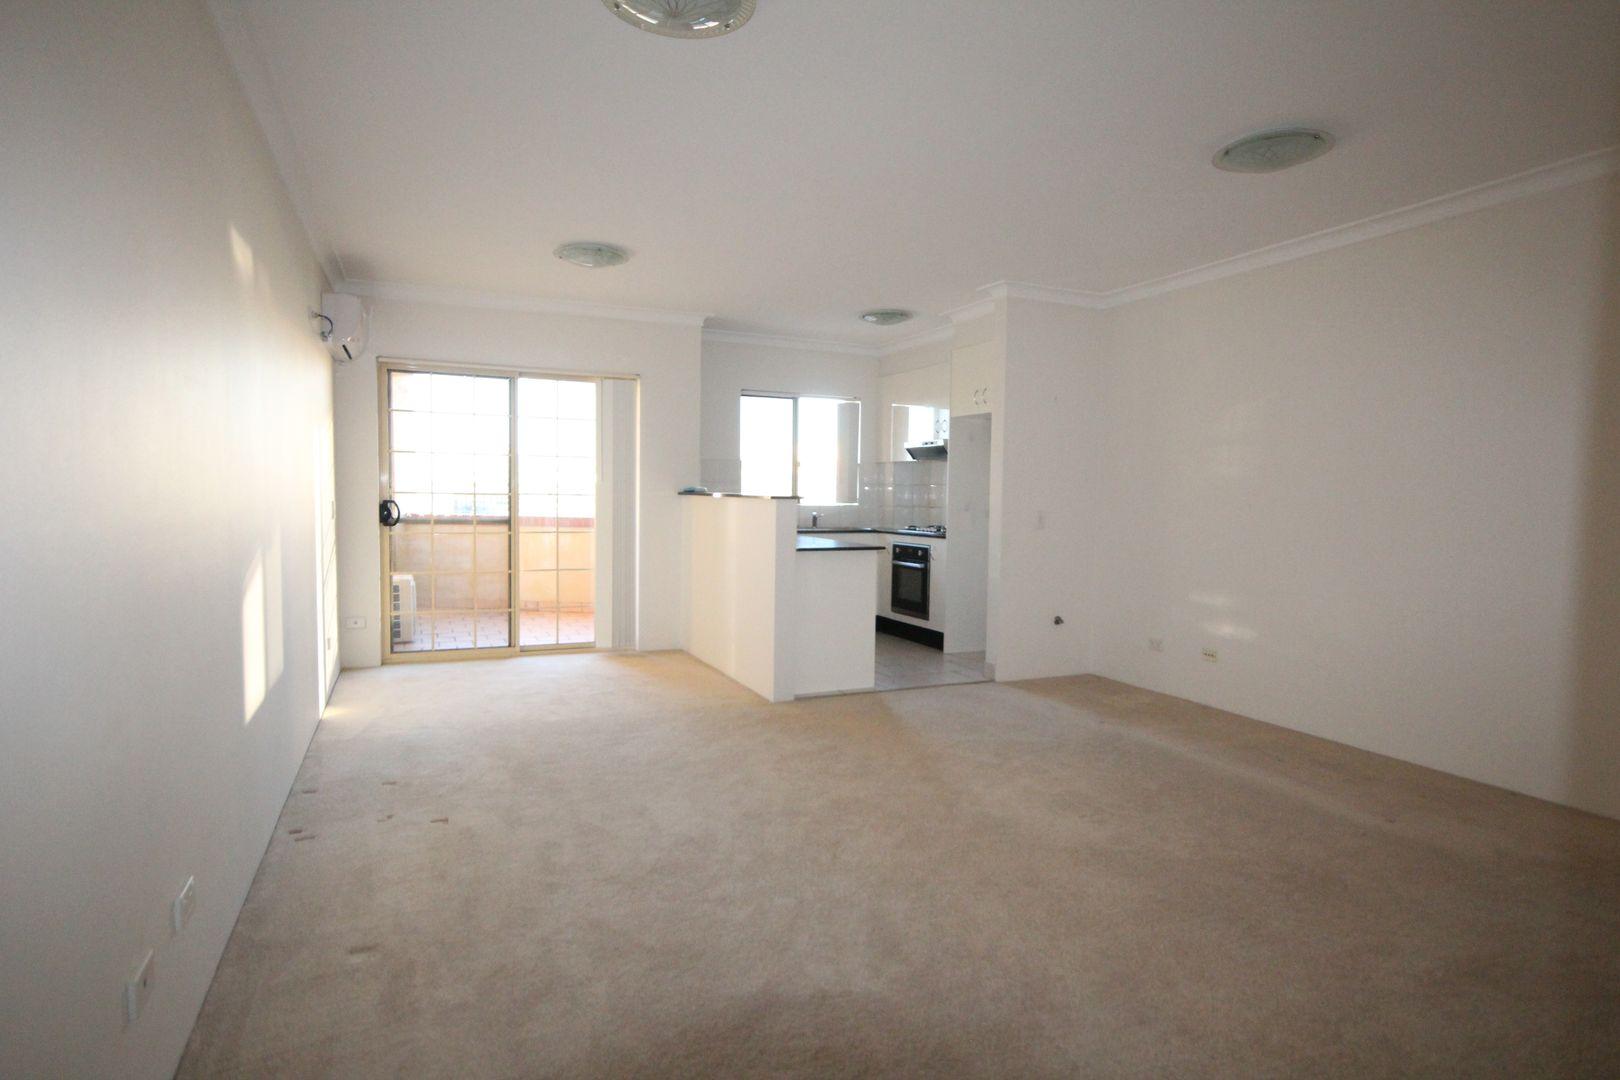 31/1 Macquarie Street, Parramatta NSW 2150, Image 0